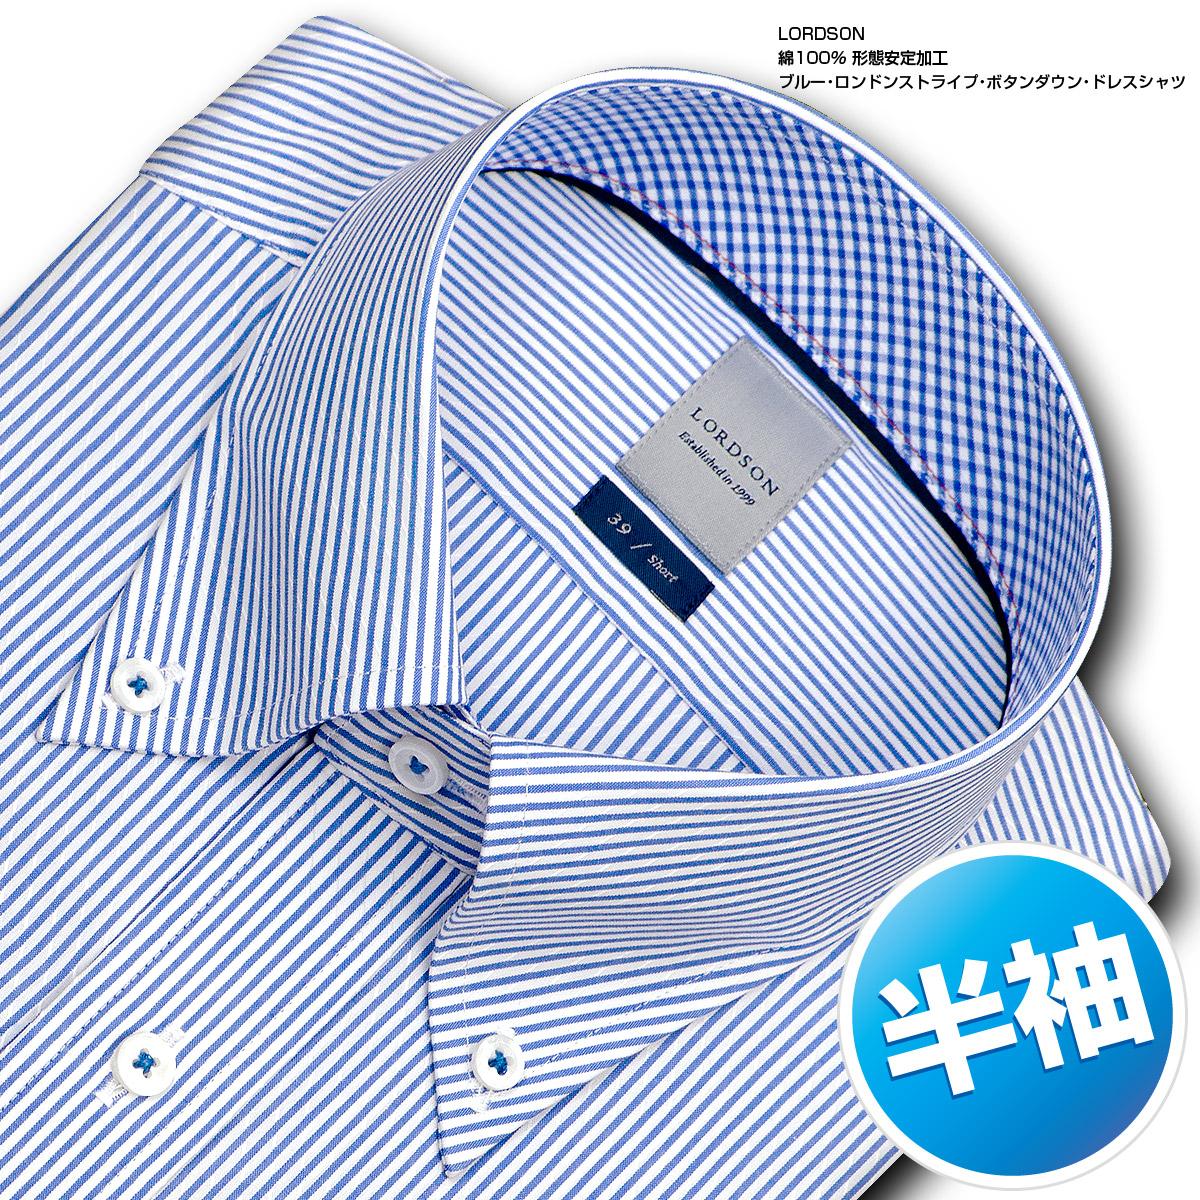 LORDSON 半袖ワイシャツ メンズ 夏 形態安定加工 ブルーのロンドンストライプ ボタンダウン ドレスシャツ|綿:100% ブルー(zon500-350)